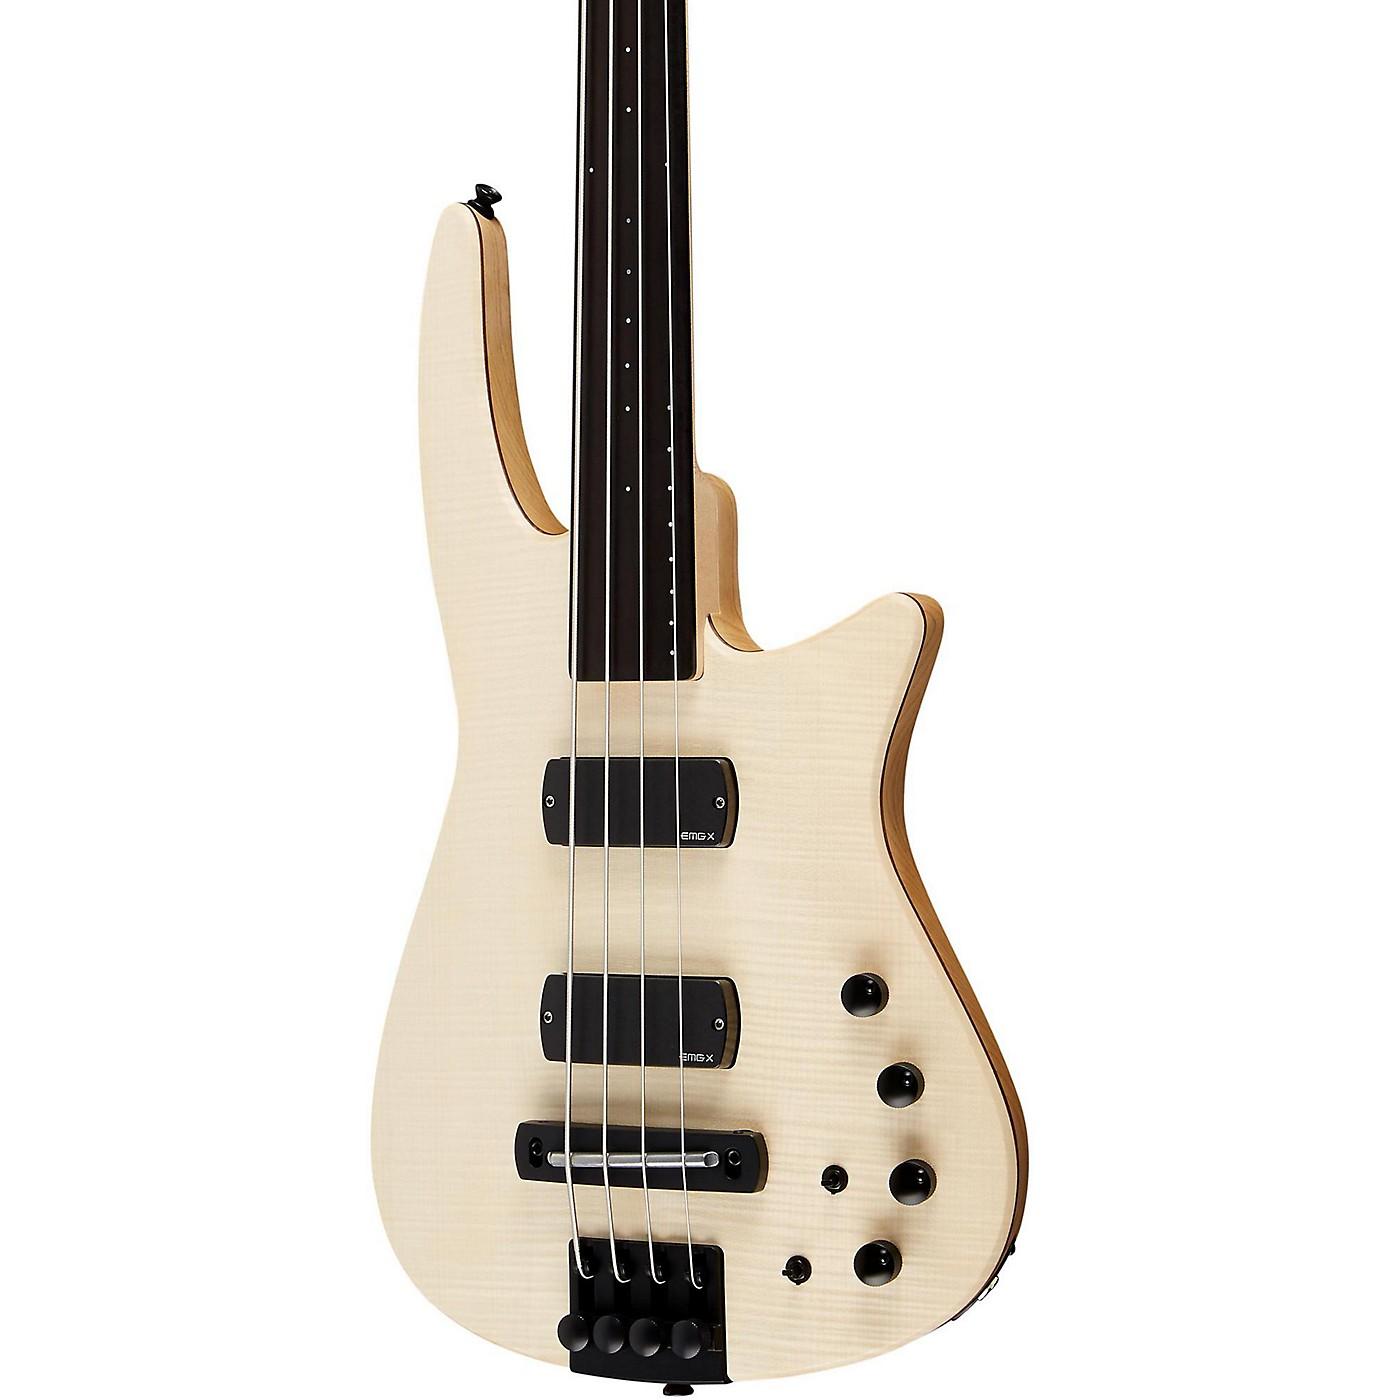 NS Design CR4 Fretless Electric Bass Guitar thumbnail